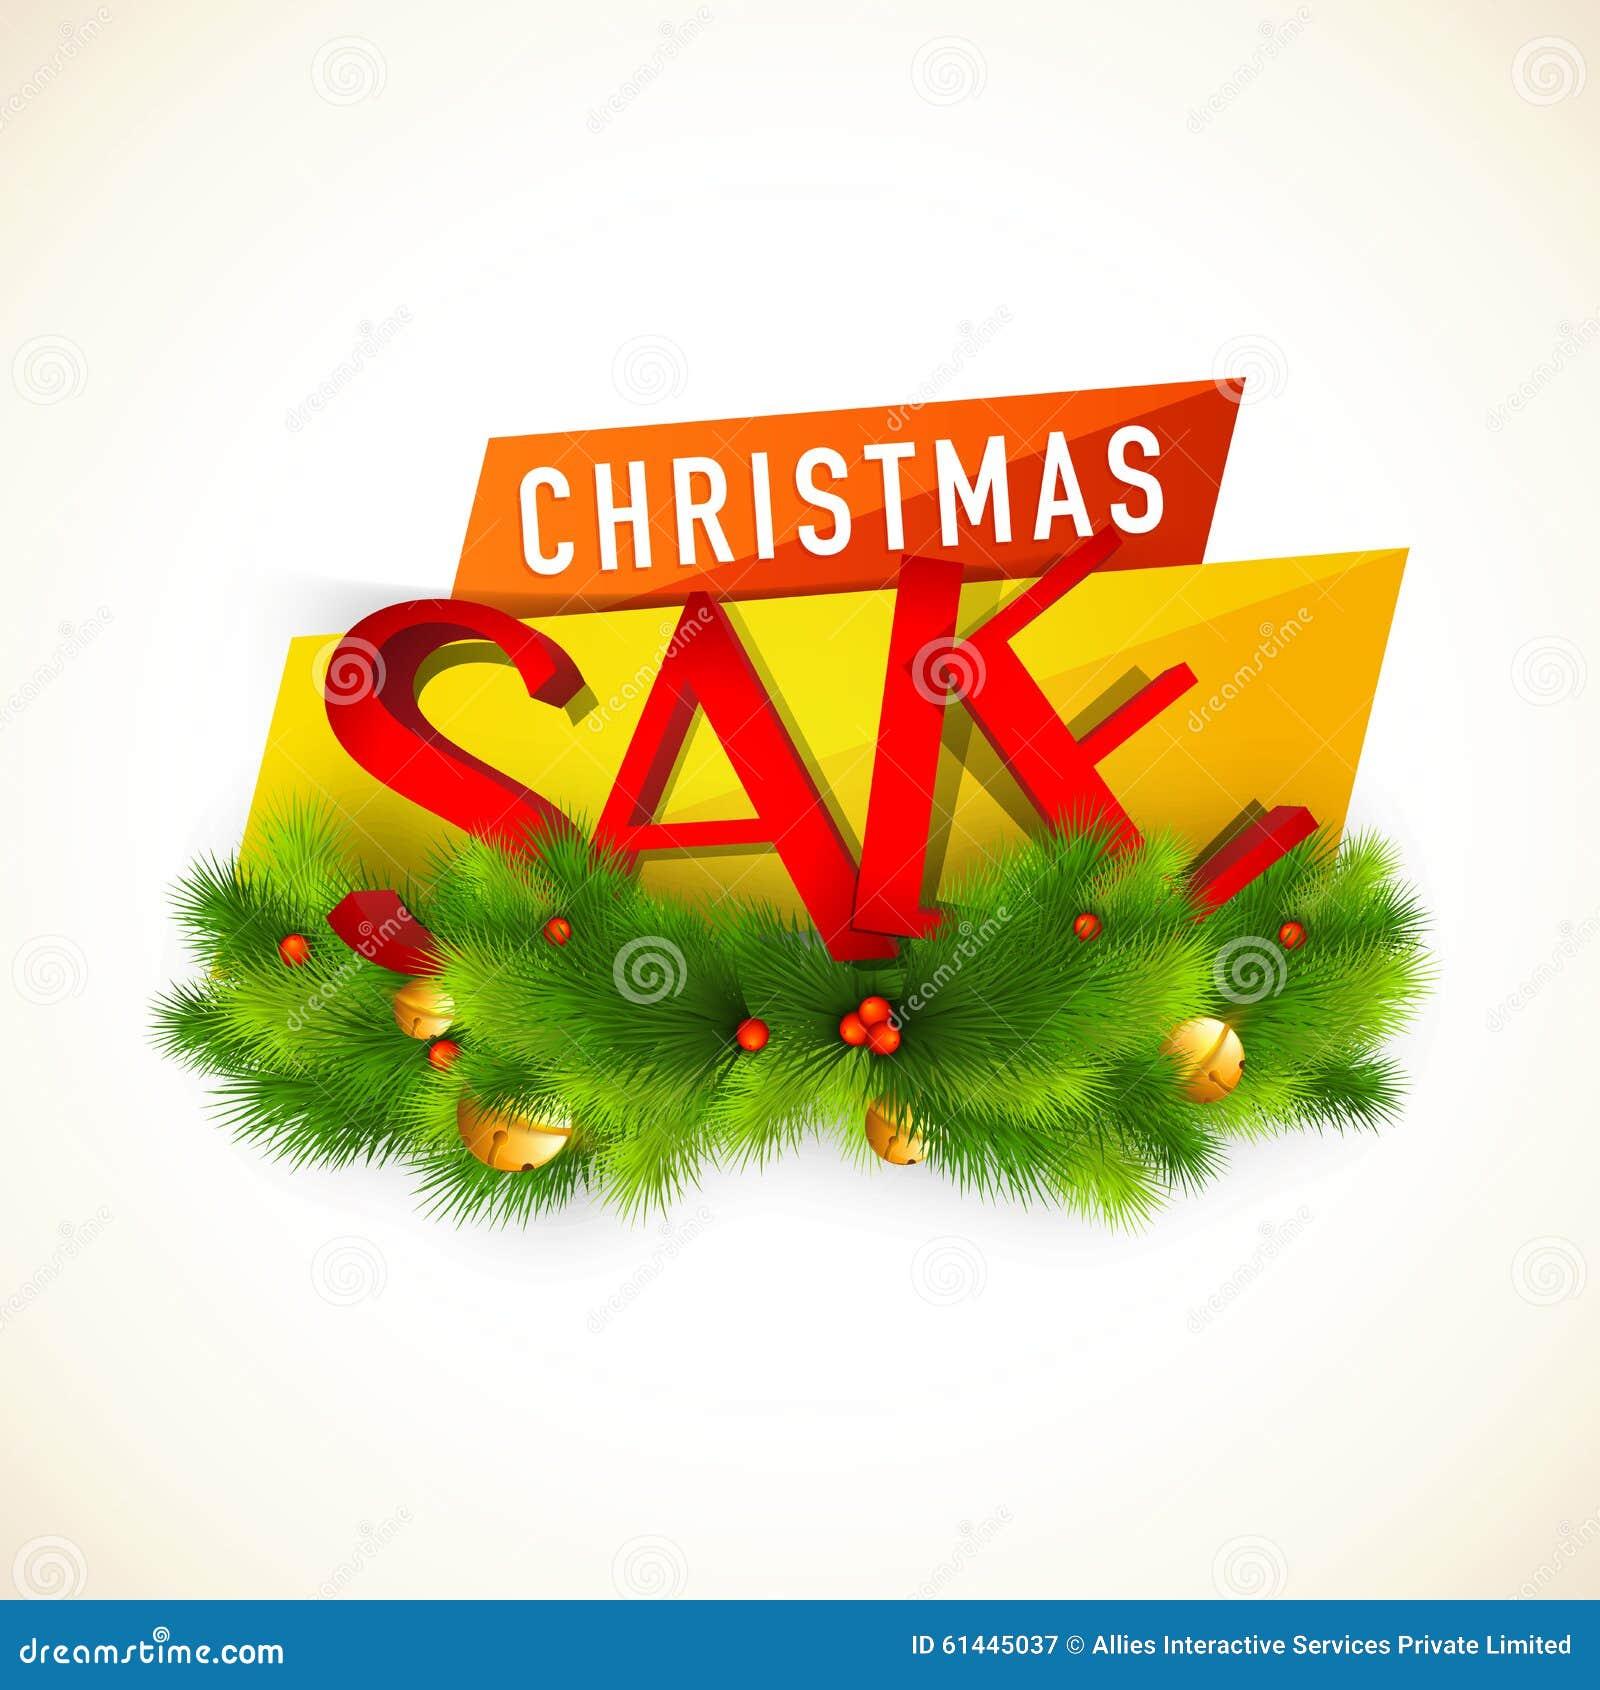 christmas poster banner or flyer design stock illustration christmas poster banner or flyer design